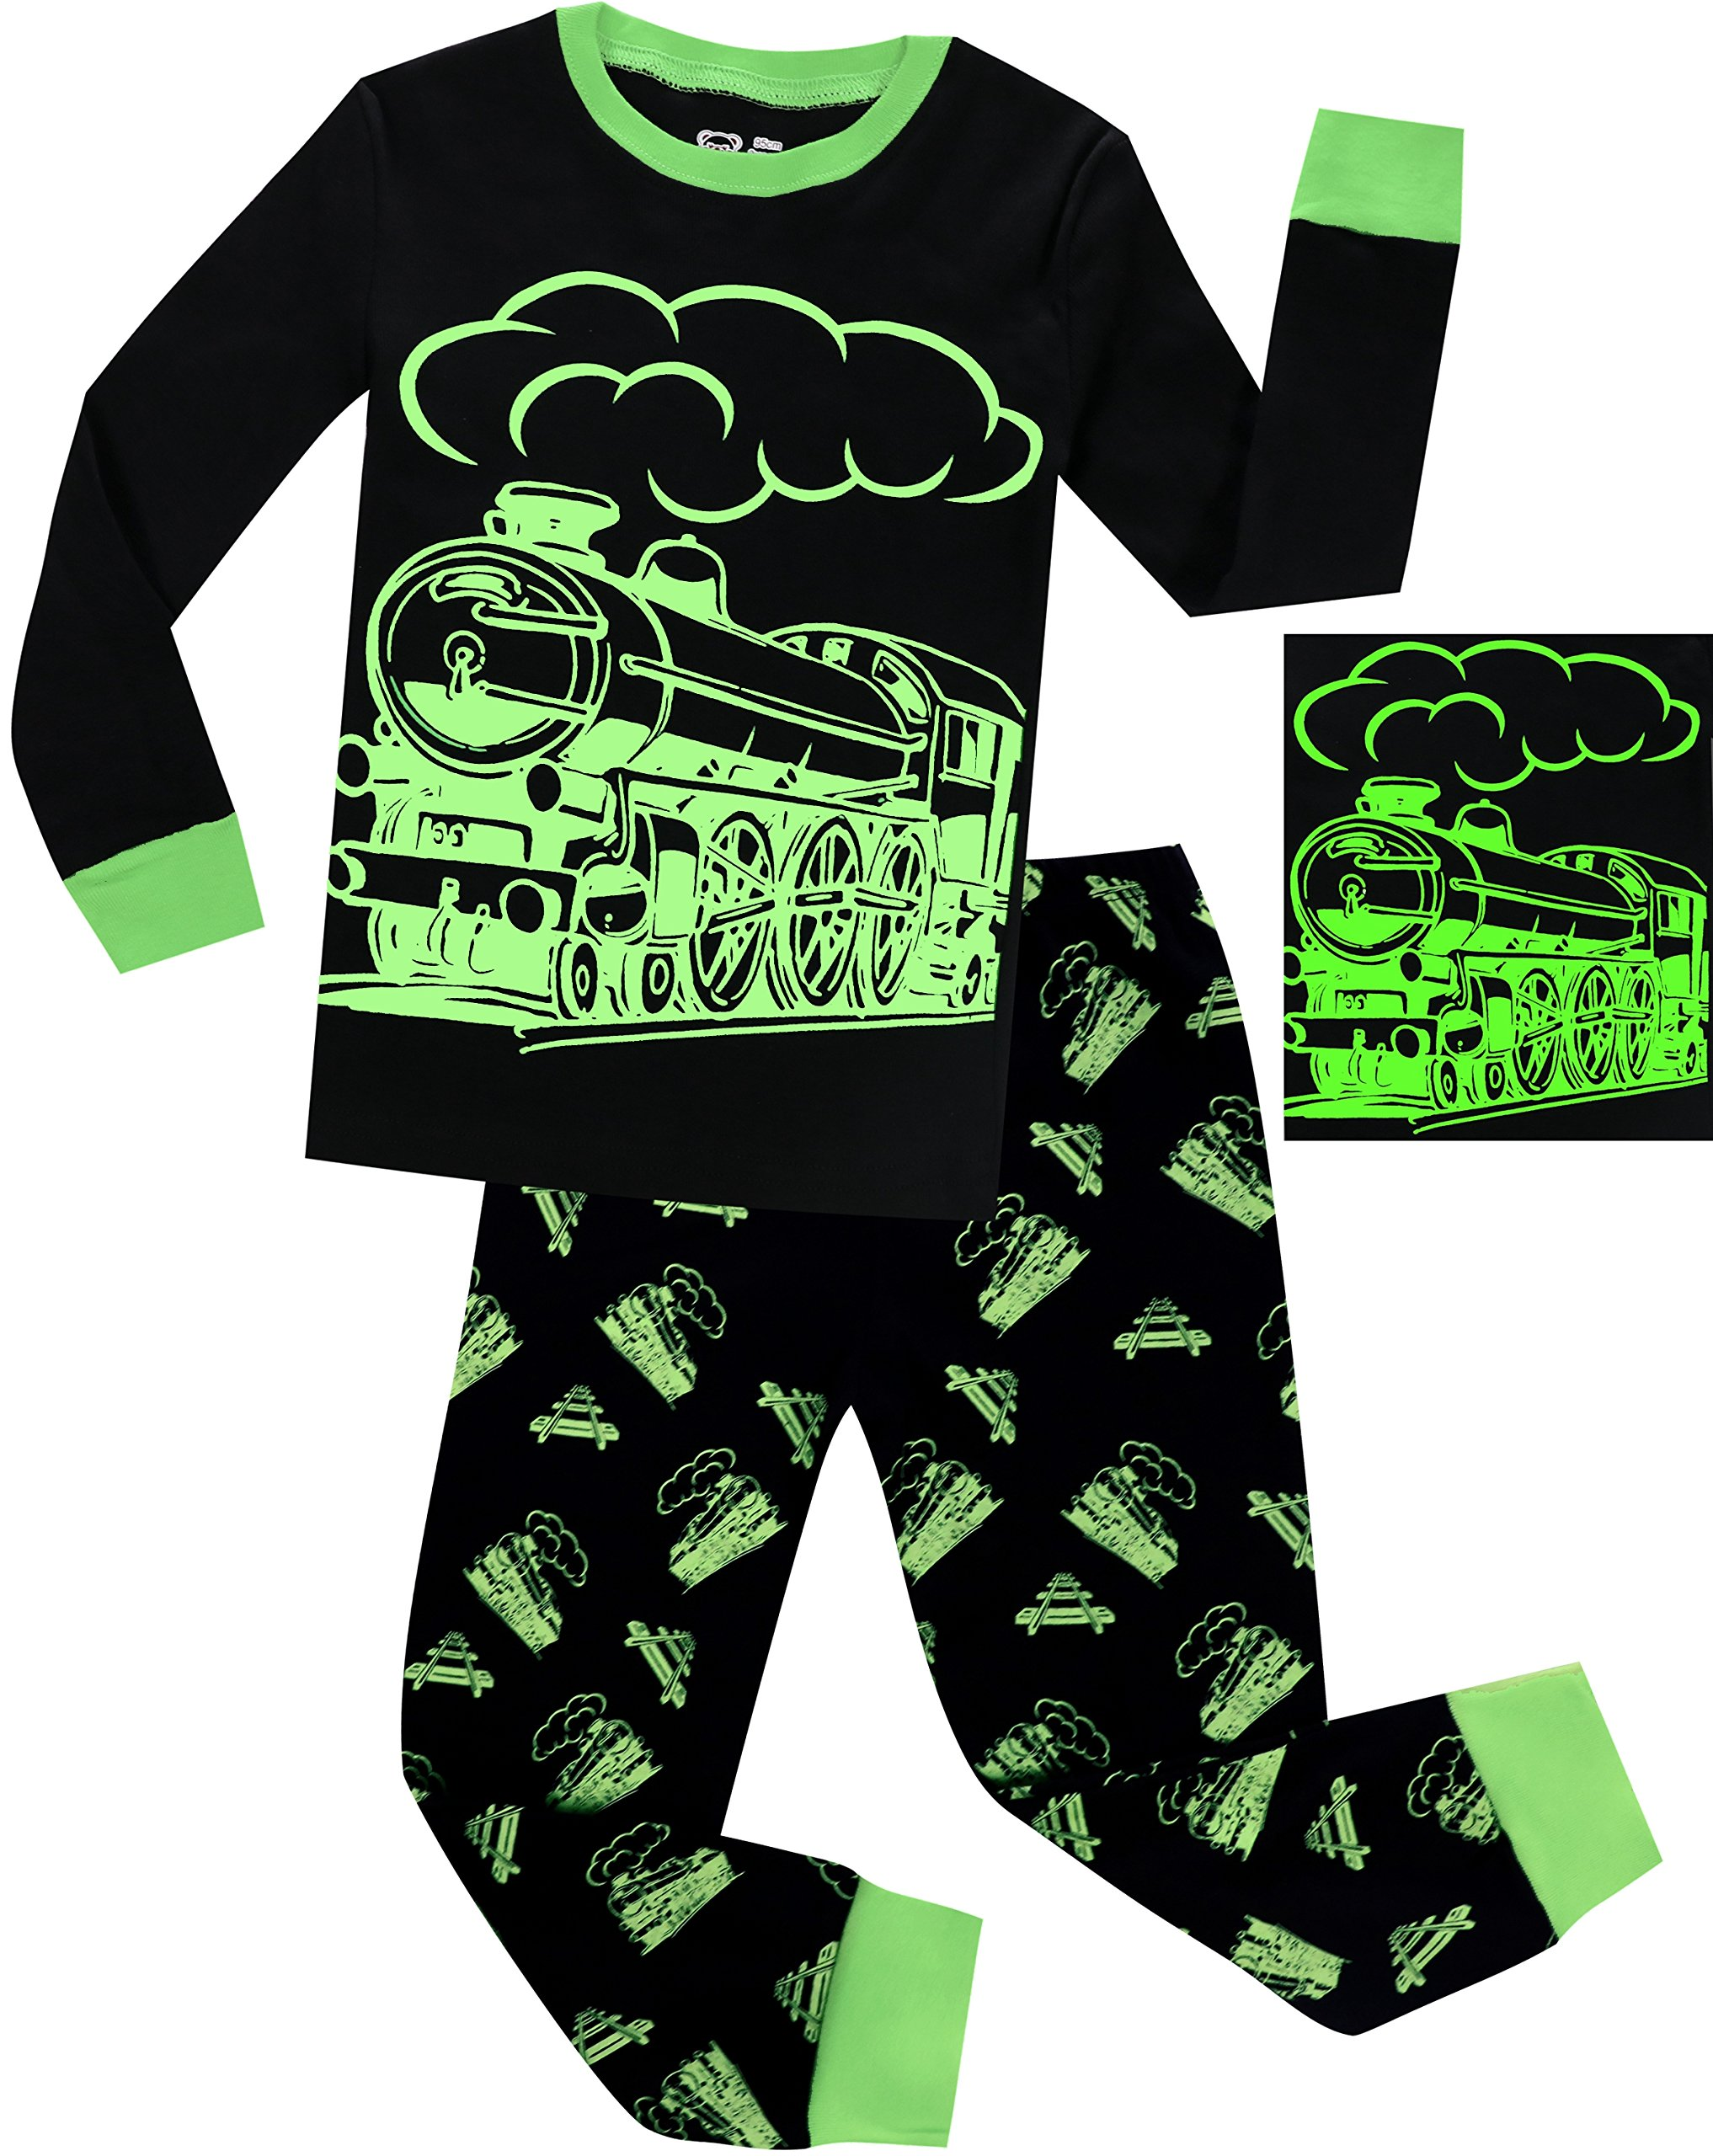 Boys Christmas Pajamas Pjs for Girls Sleepwear Children Clothes Stripe Pants Set Size 8 by BebeBear (Image #1)